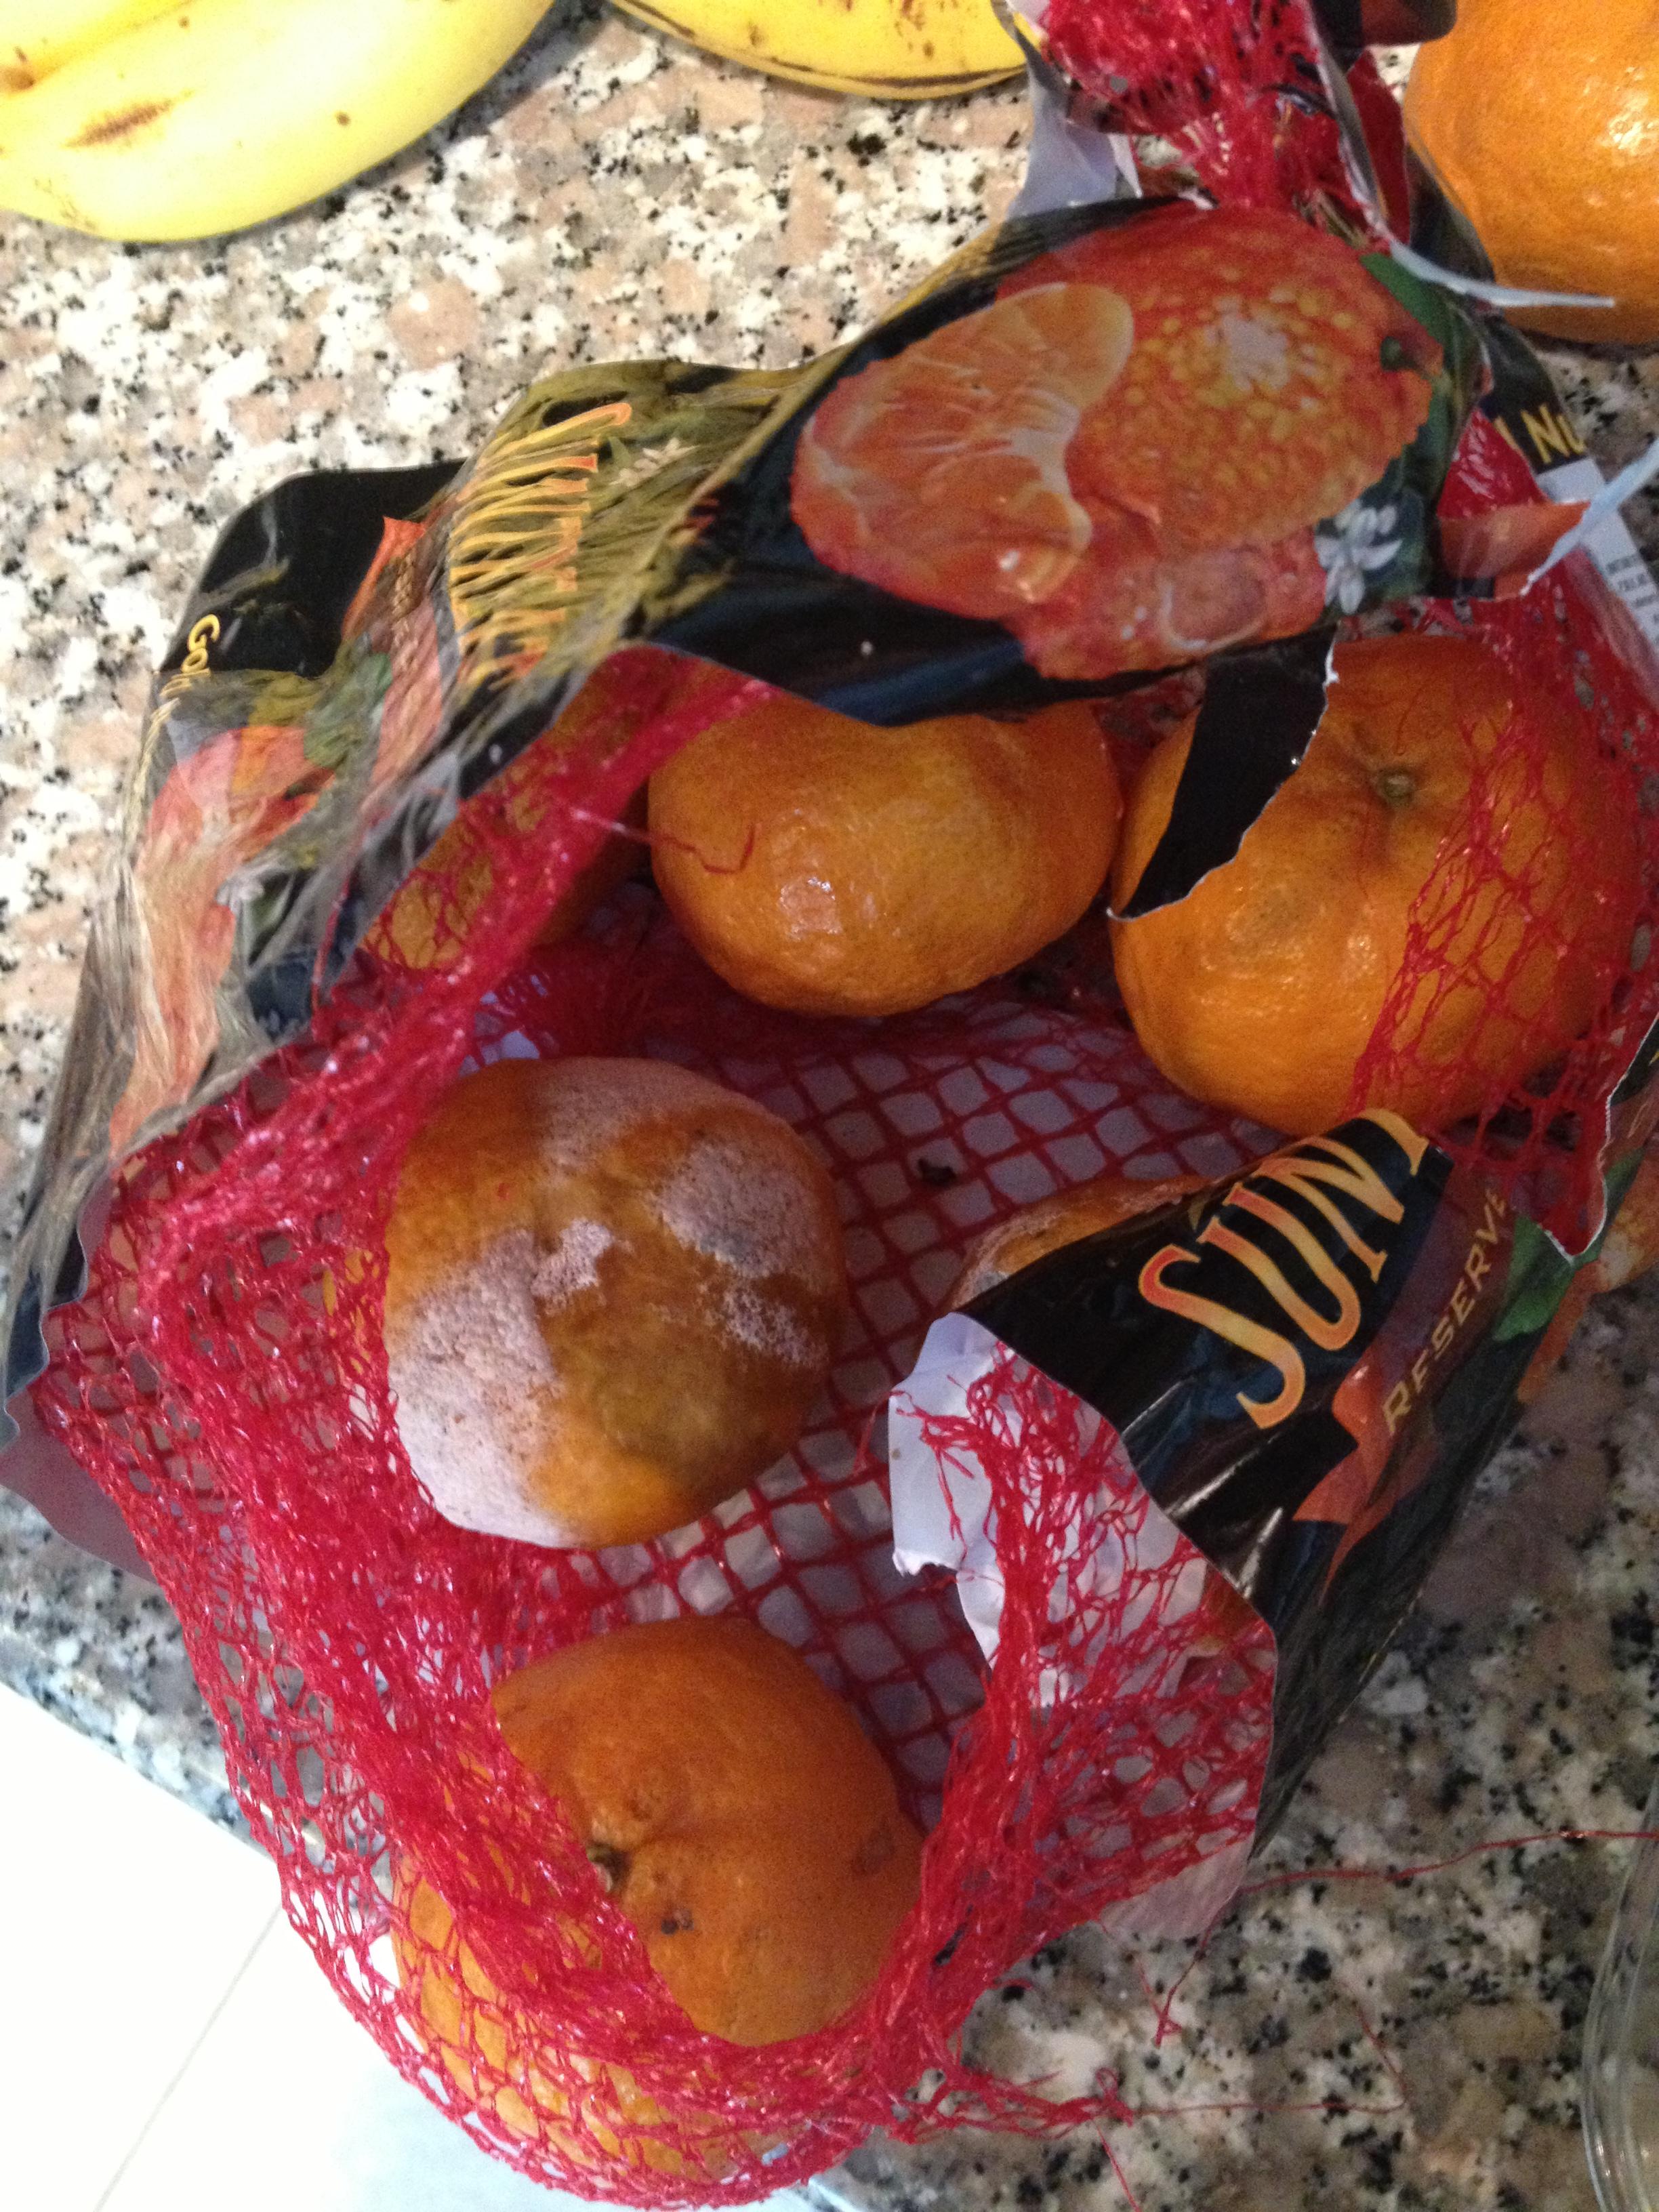 Tangerines Gone Bad